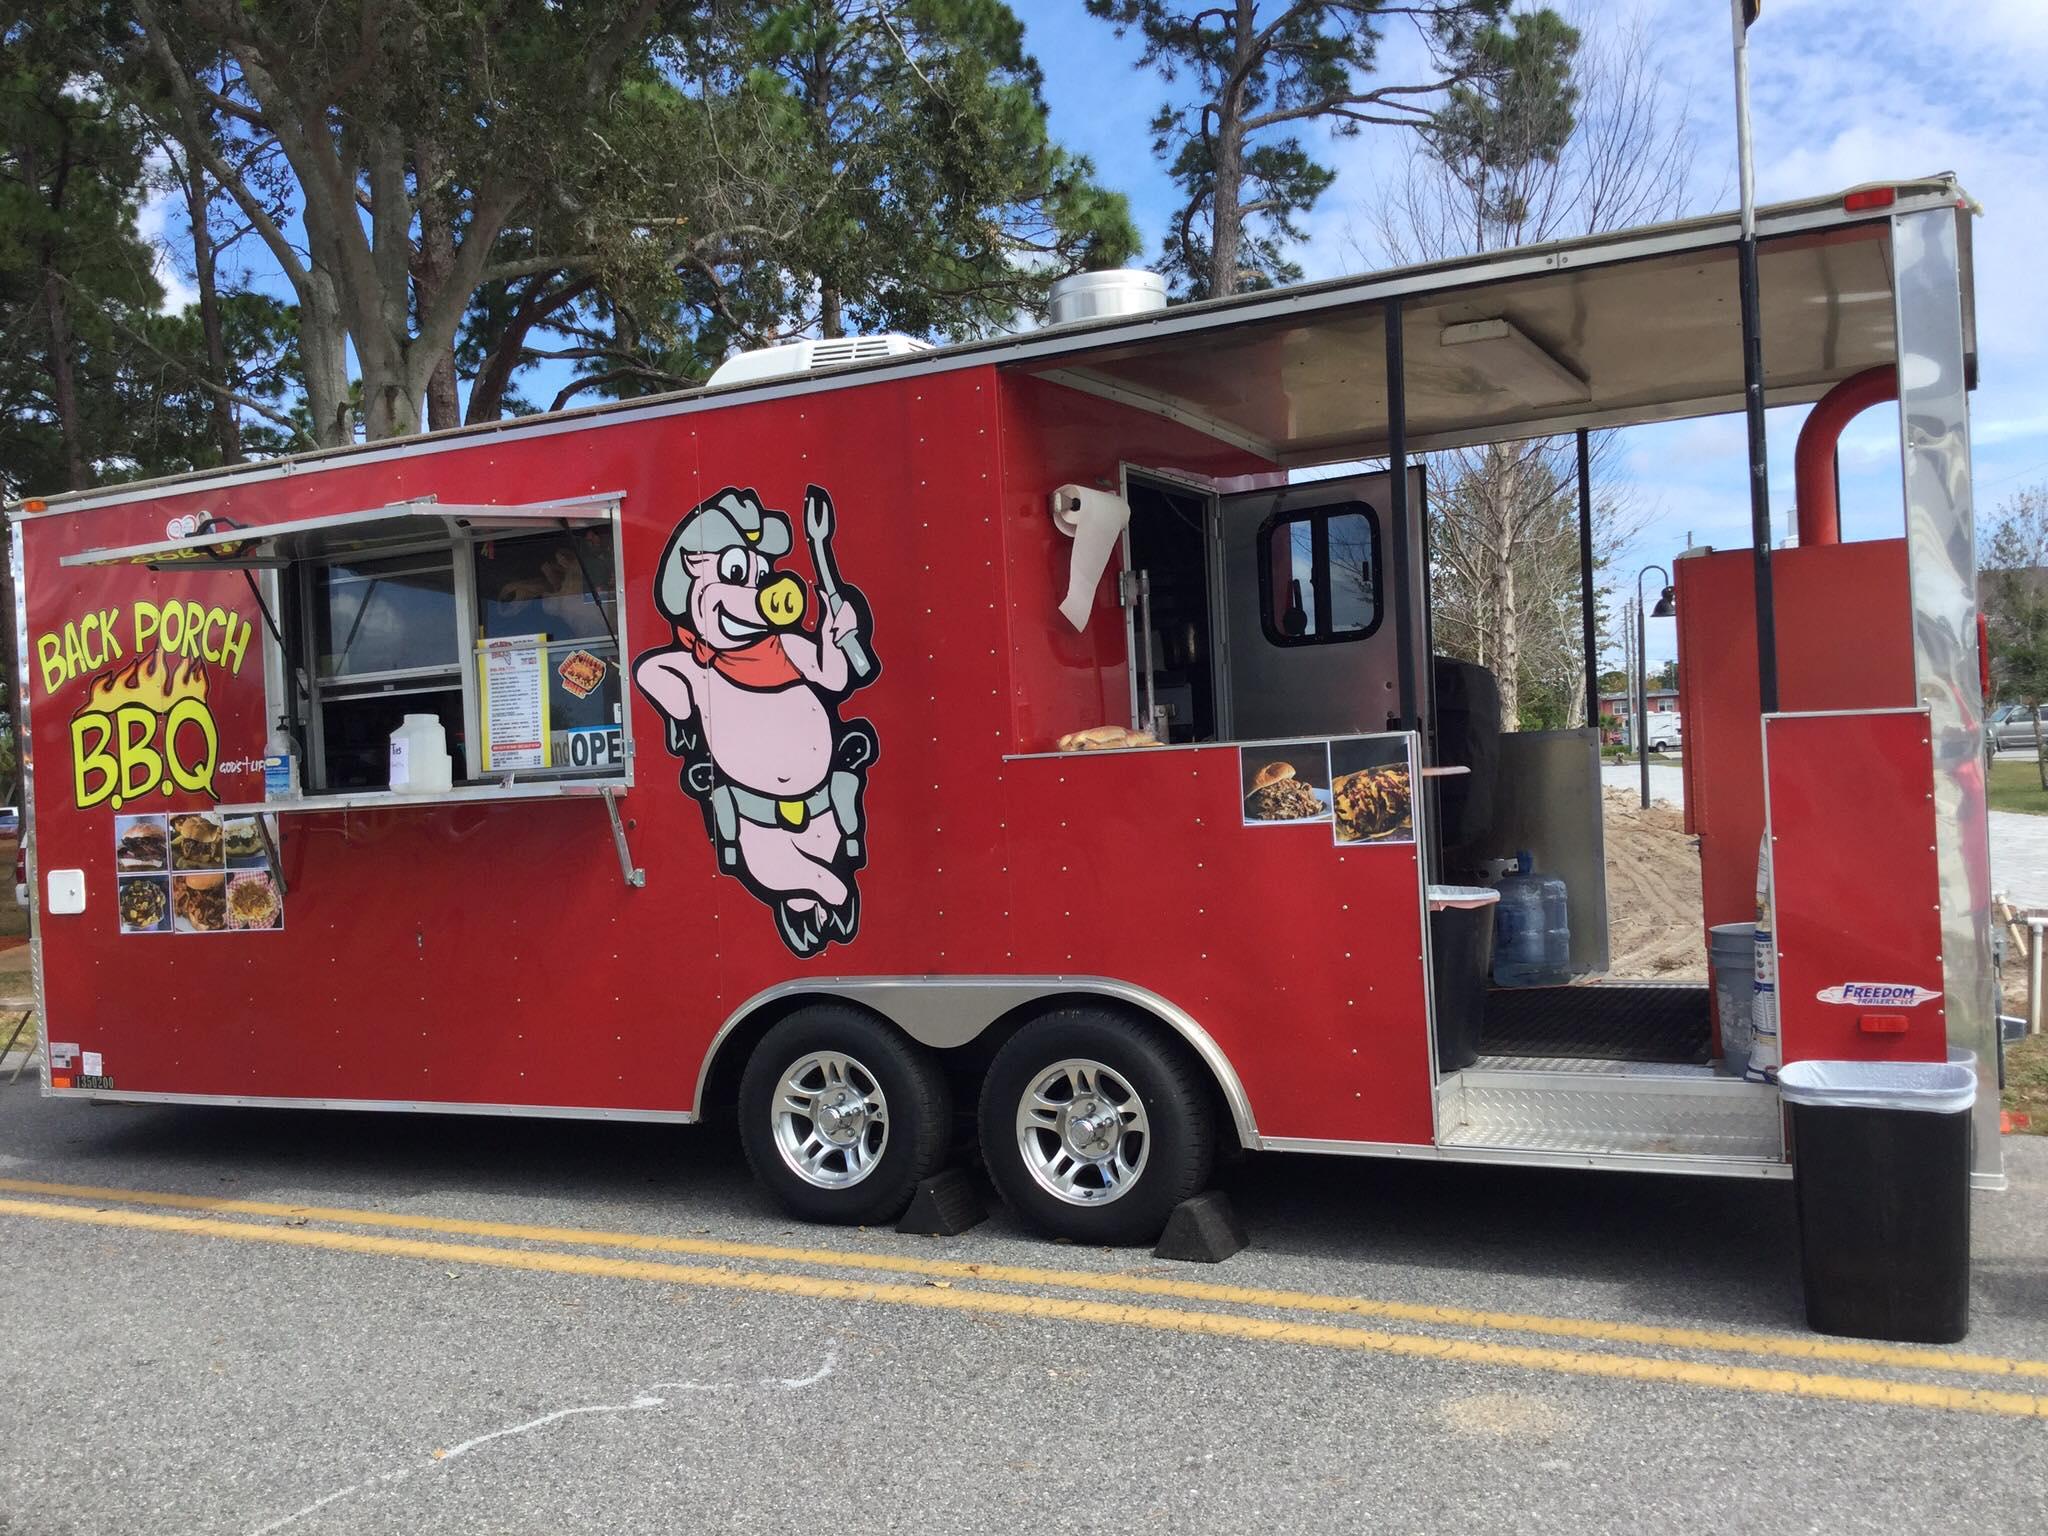 Back Porch BBQ Concession Trailer Food Truck